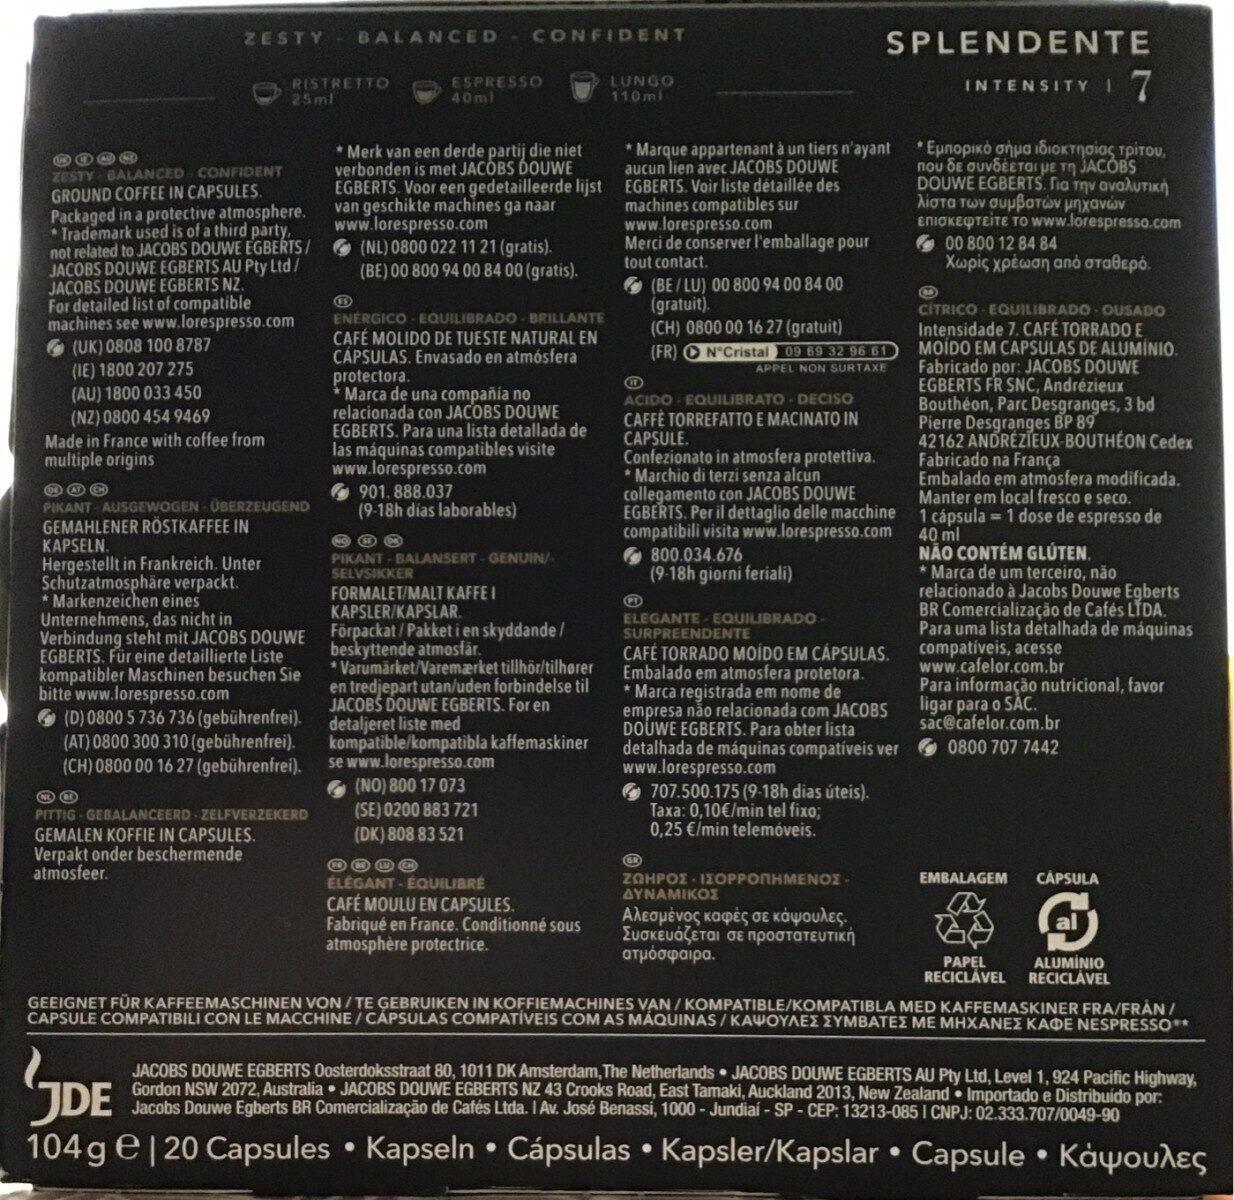 L'or espres splendente 20 capsules - Valori nutrizionali - fr